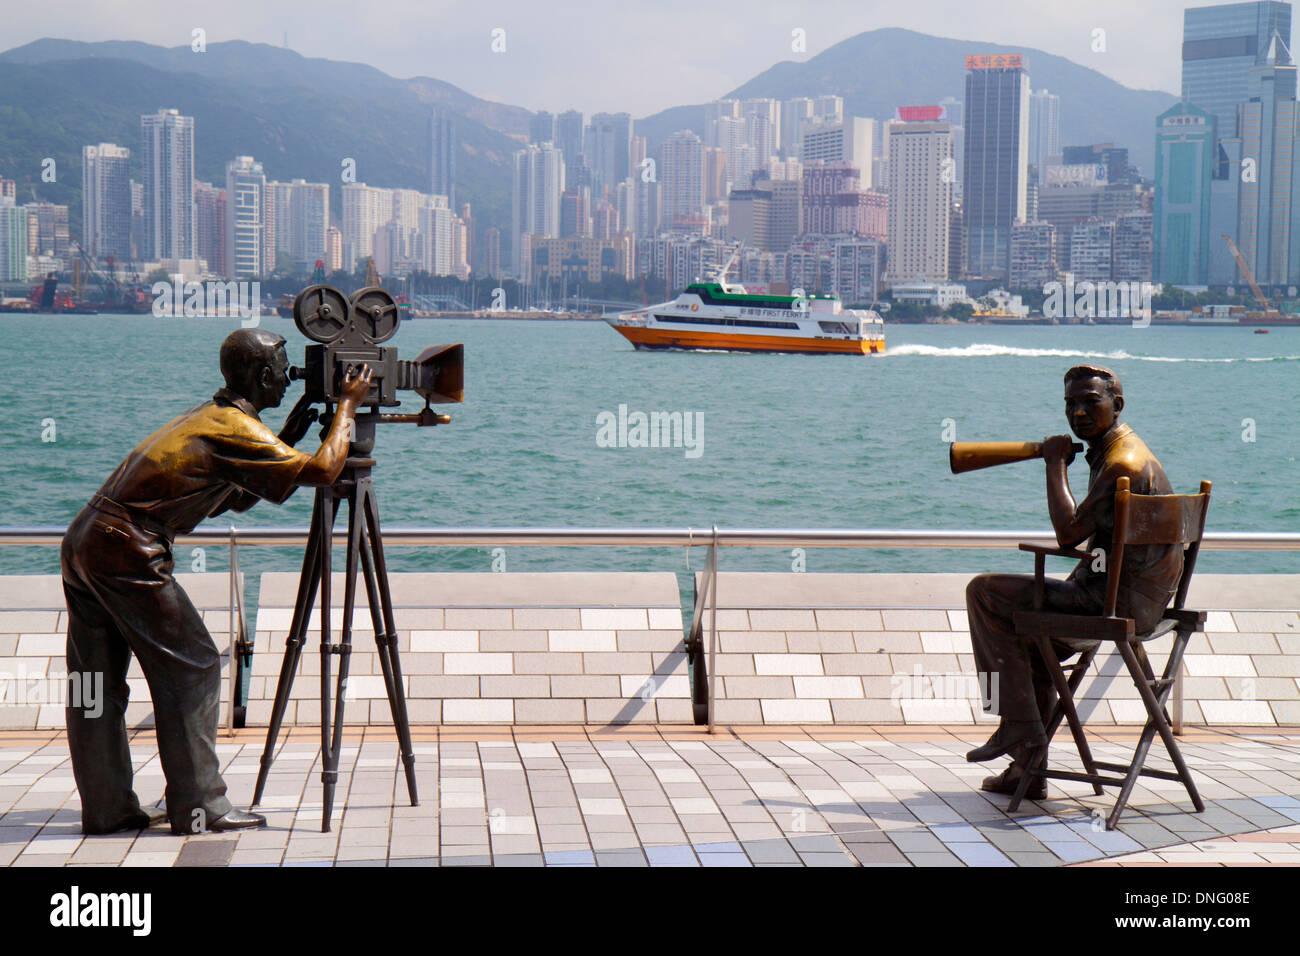 Hong Kong China Kowloon Tsim Sha Tsui Avenue der Stars Victoria Hafen Hafen Promenade bronze Statuen Film dire Stockfoto